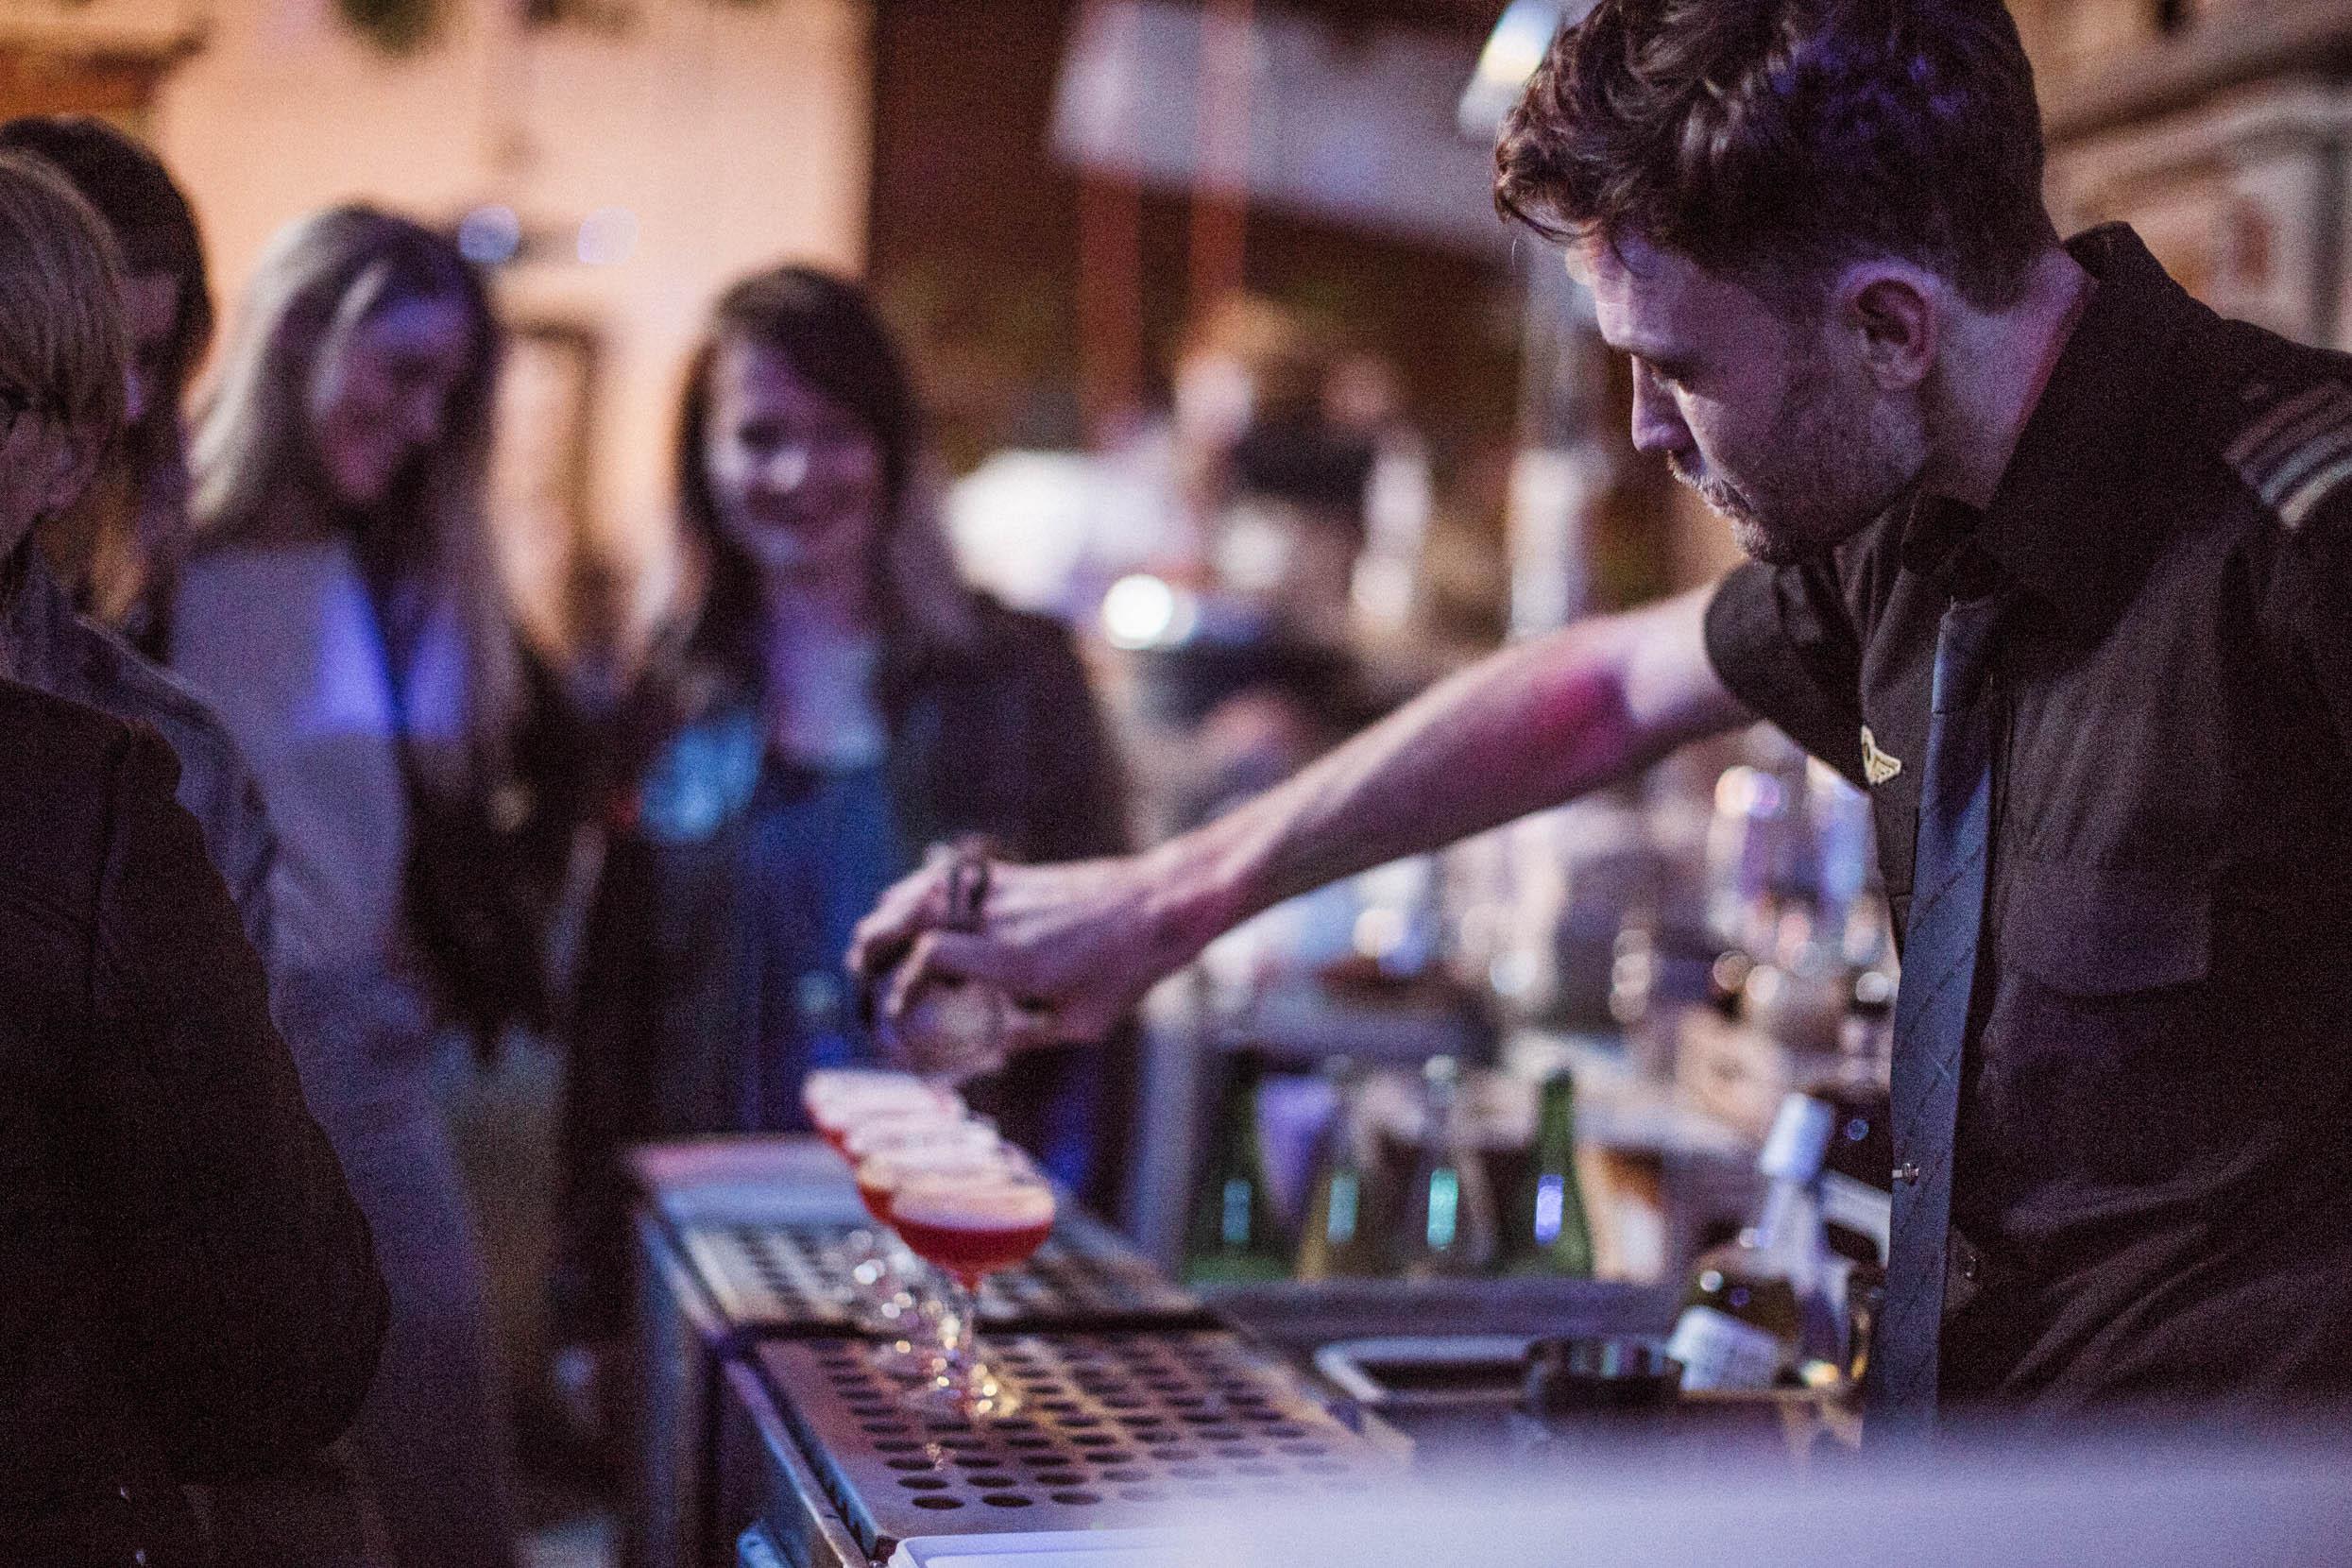 Trolley_d_ClaytonDonovan native cocktails.jpg